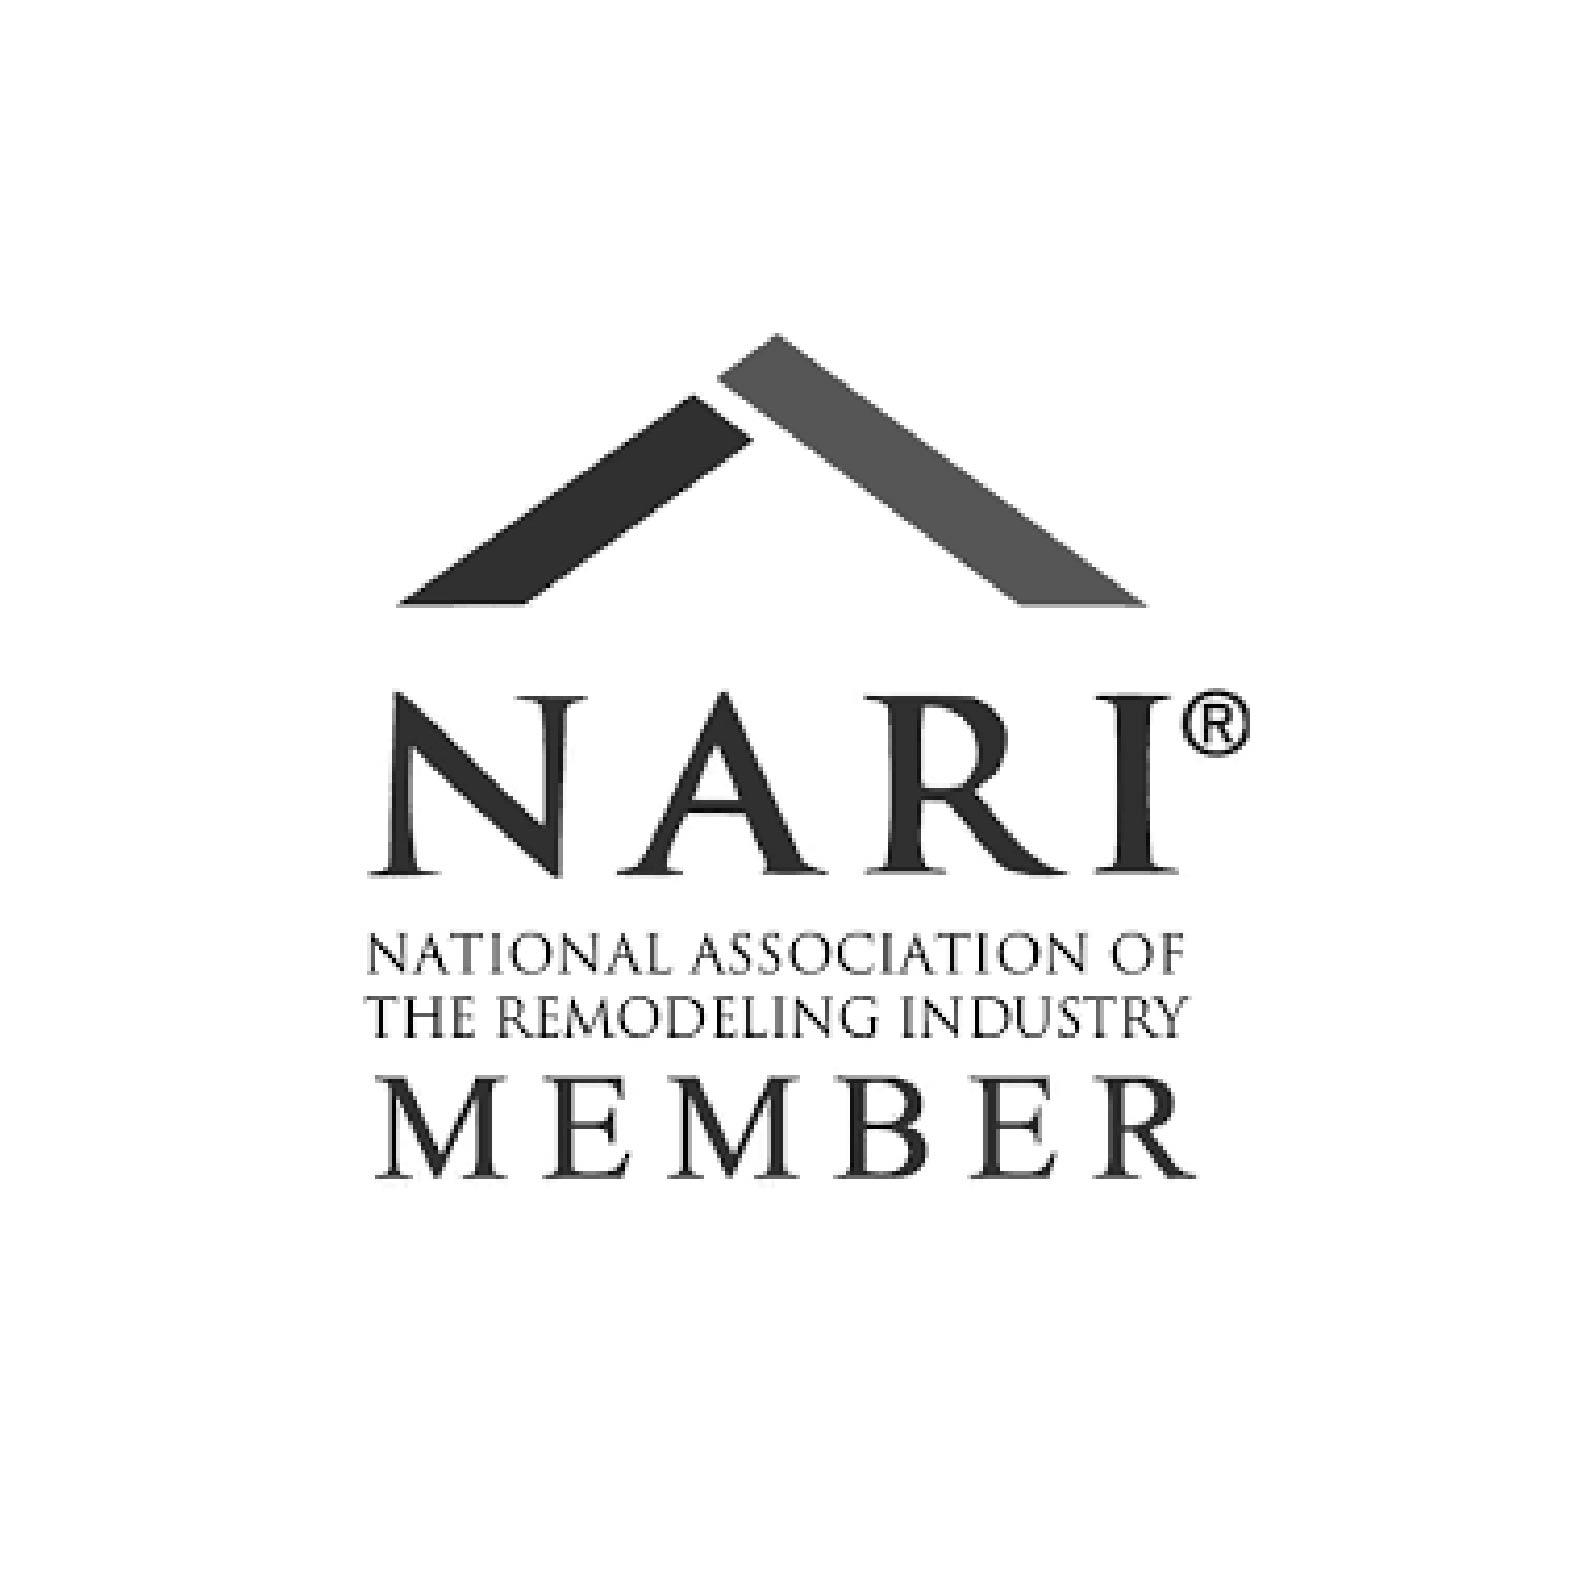 NARI logo-01.jpg